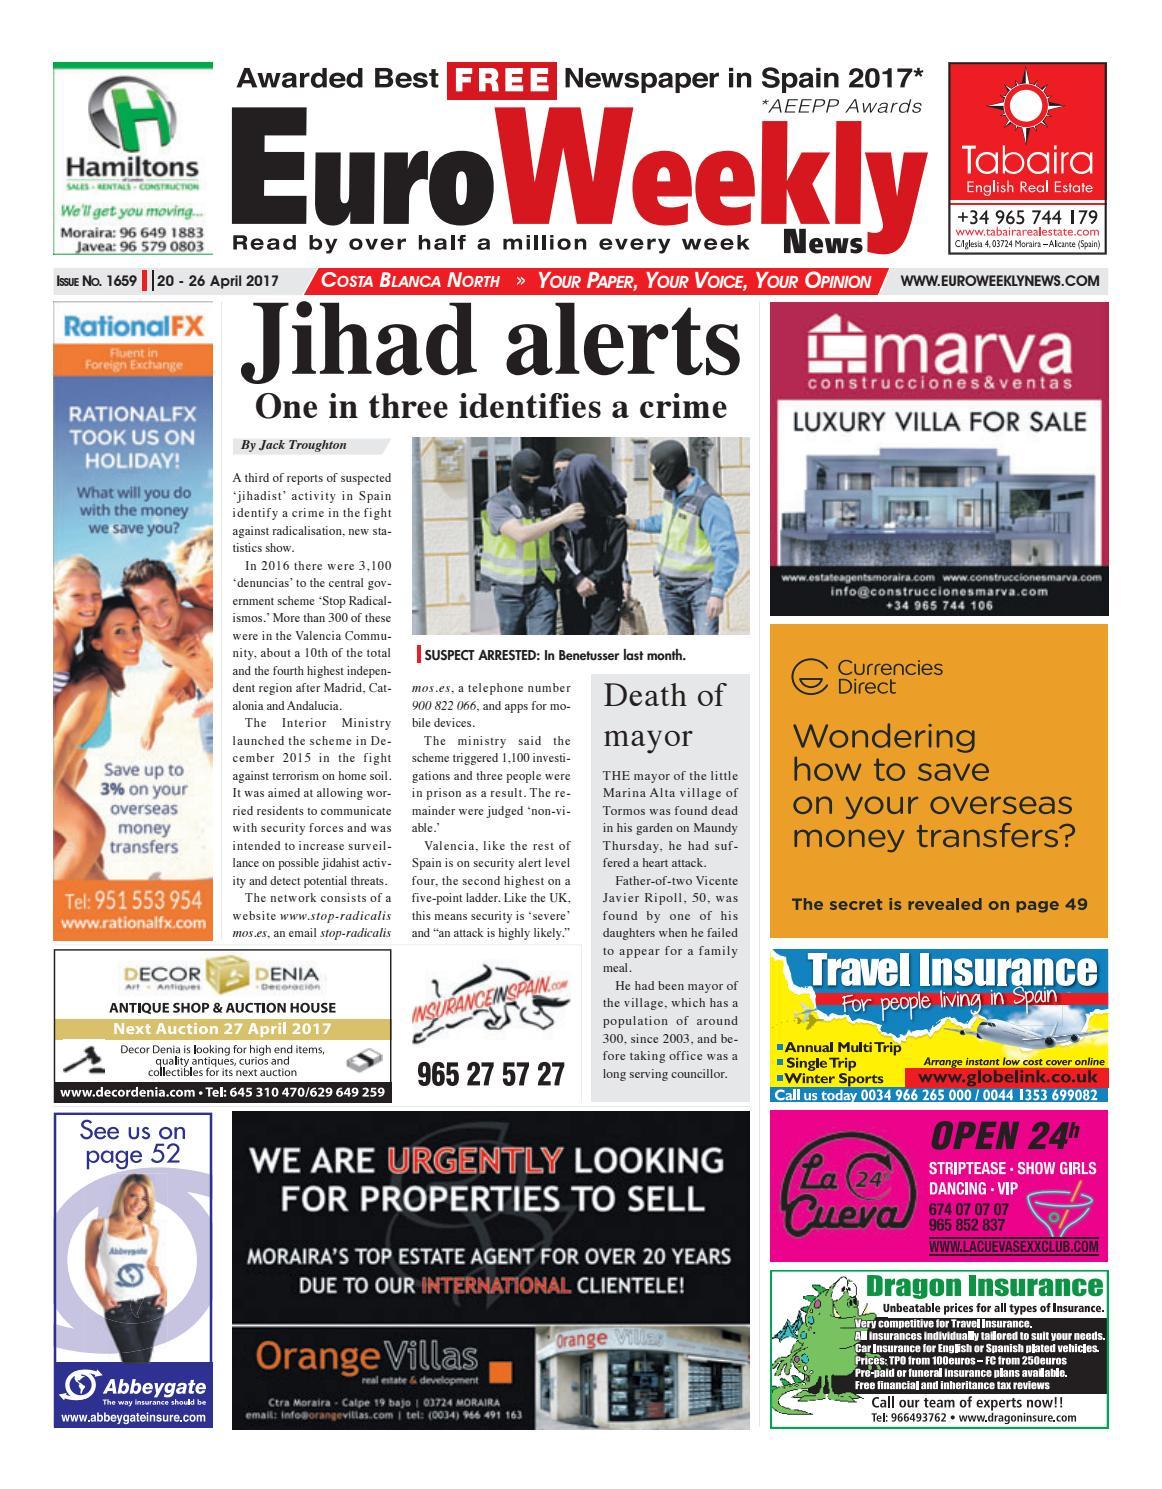 Euro Weekly News Costa Blanca North 20 26 April 2017